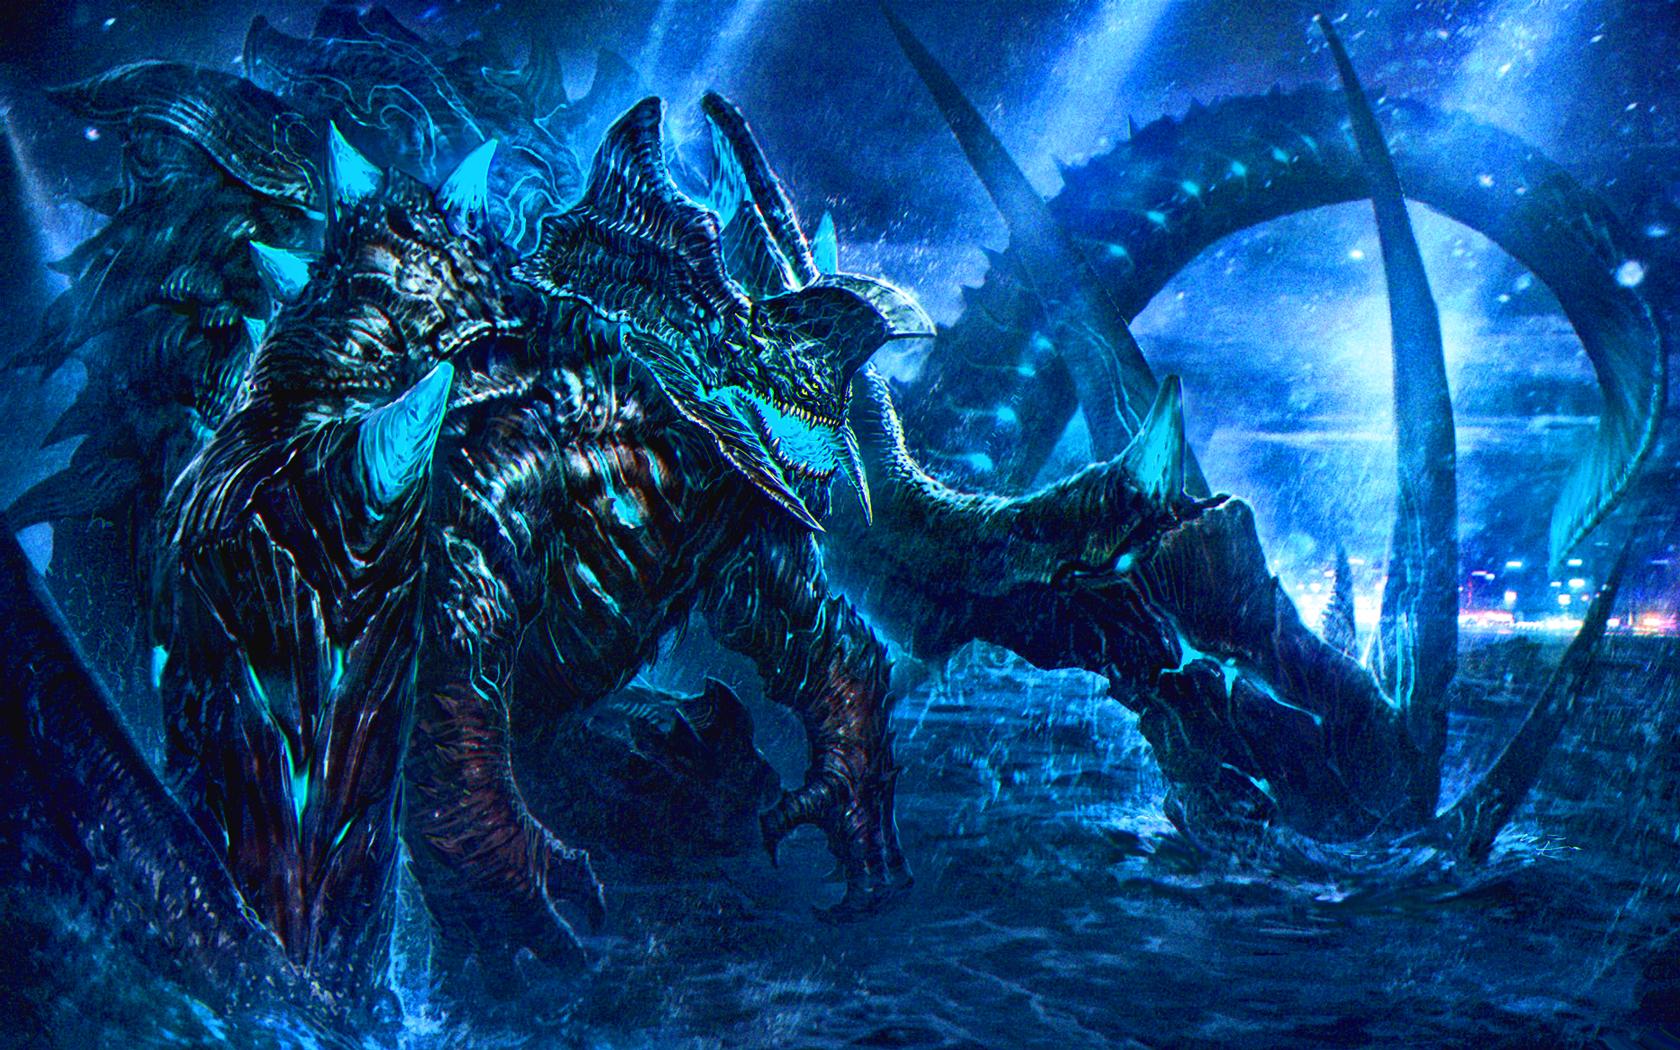 Neo Kaiju Wallpaper and Background Image | 1680x1050 | ID ... Pacific Rim Kaiju Category 100